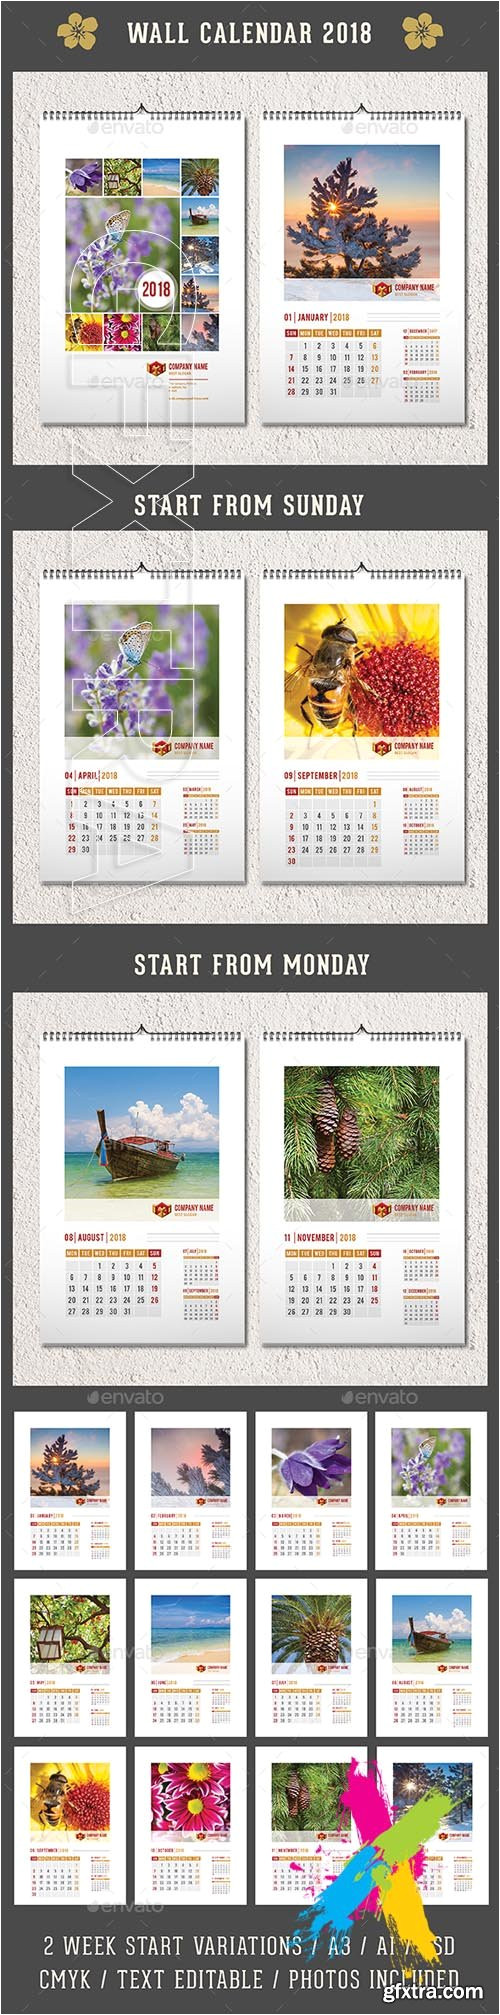 Adobe Photoshop Calendar Template Gr Wall Calendar 2018 20174693 Vector Photoshop